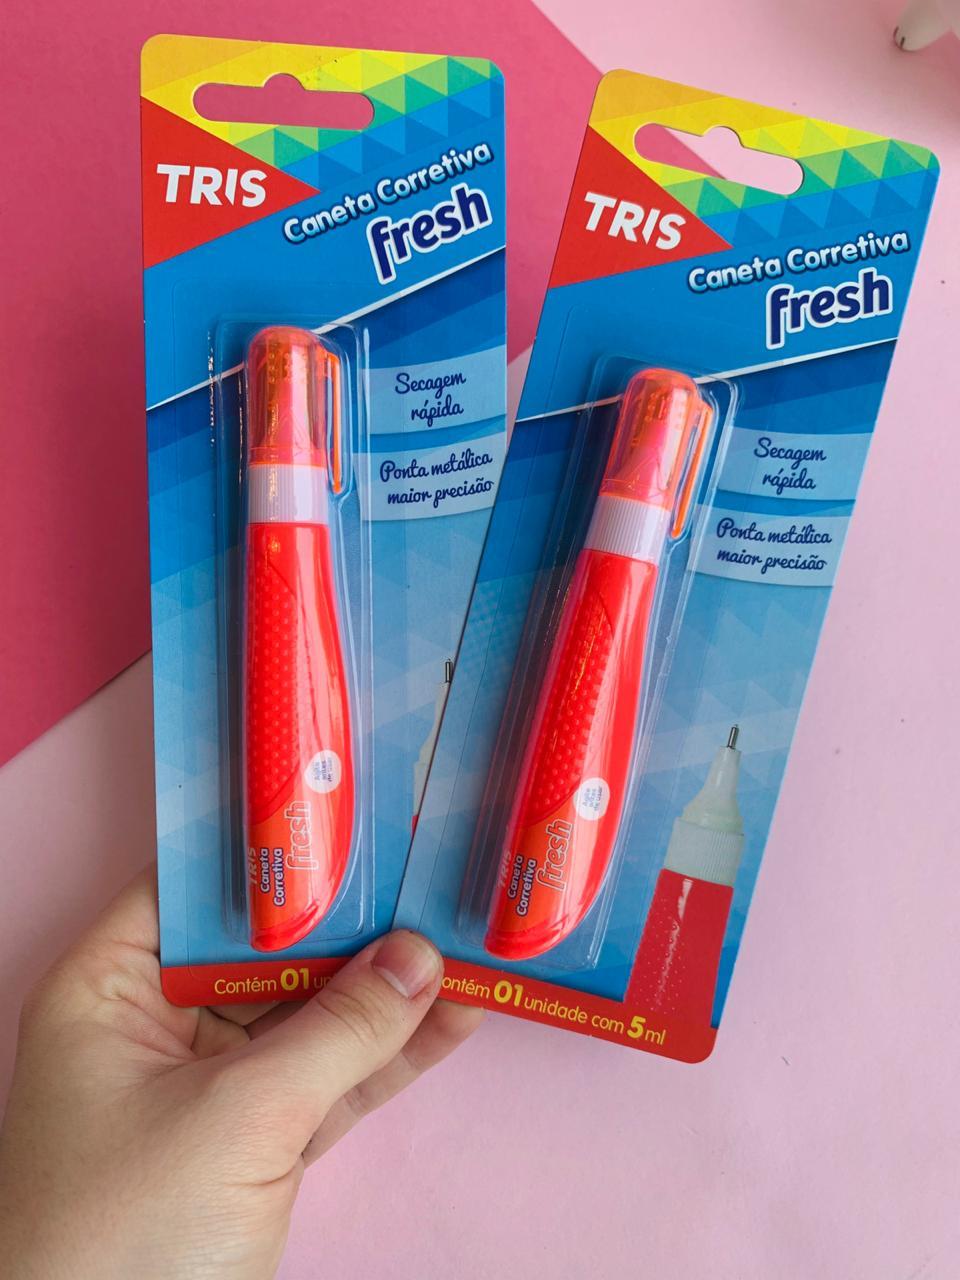 Caneta Corretiva Fresh | TRIS